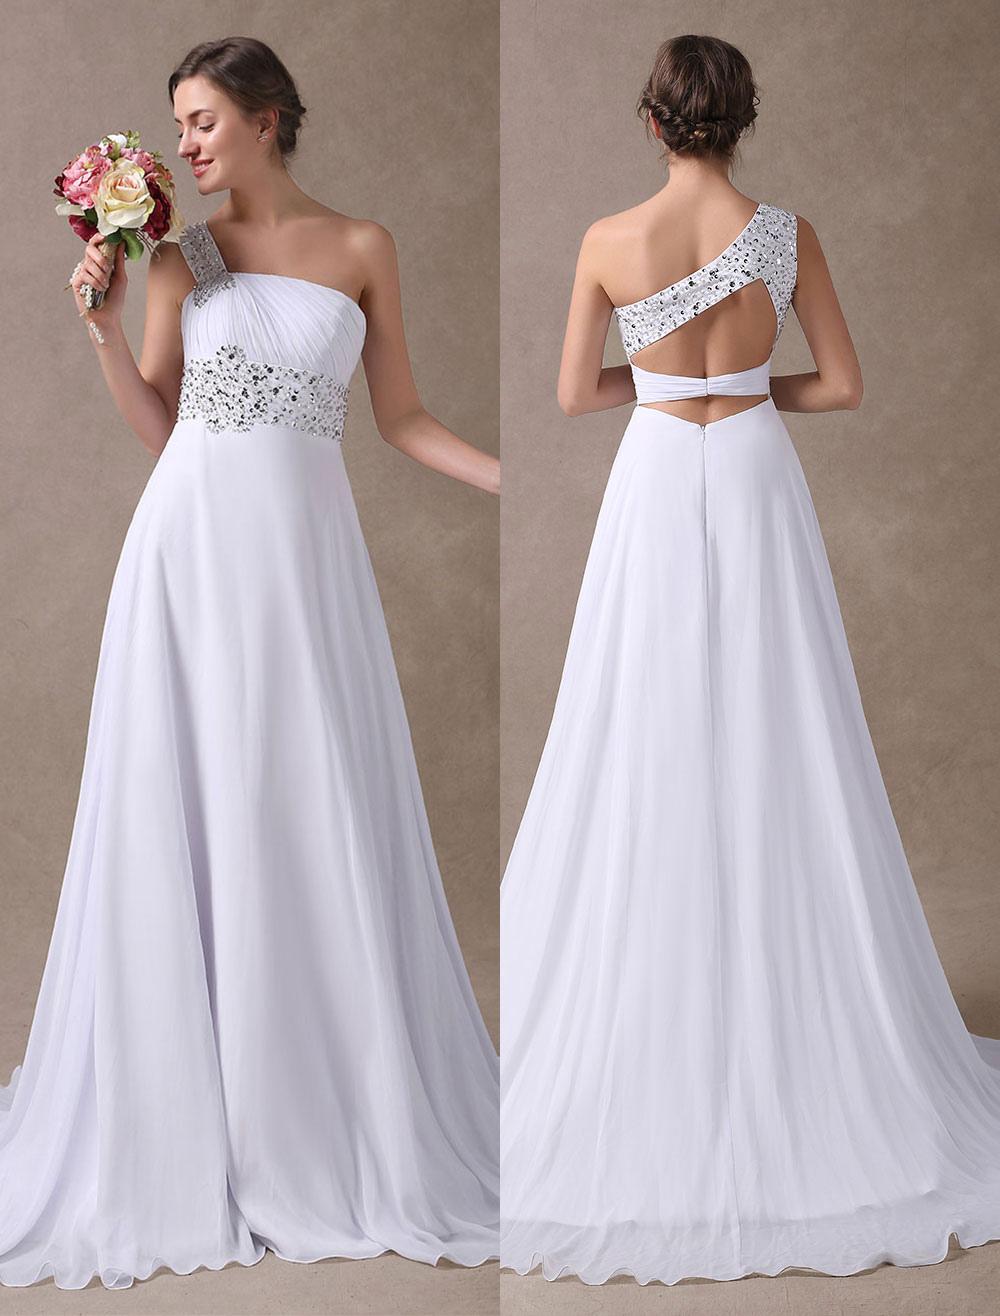 White Wedding Dresses One Shoulder Beach Bridal Dress Chiffon